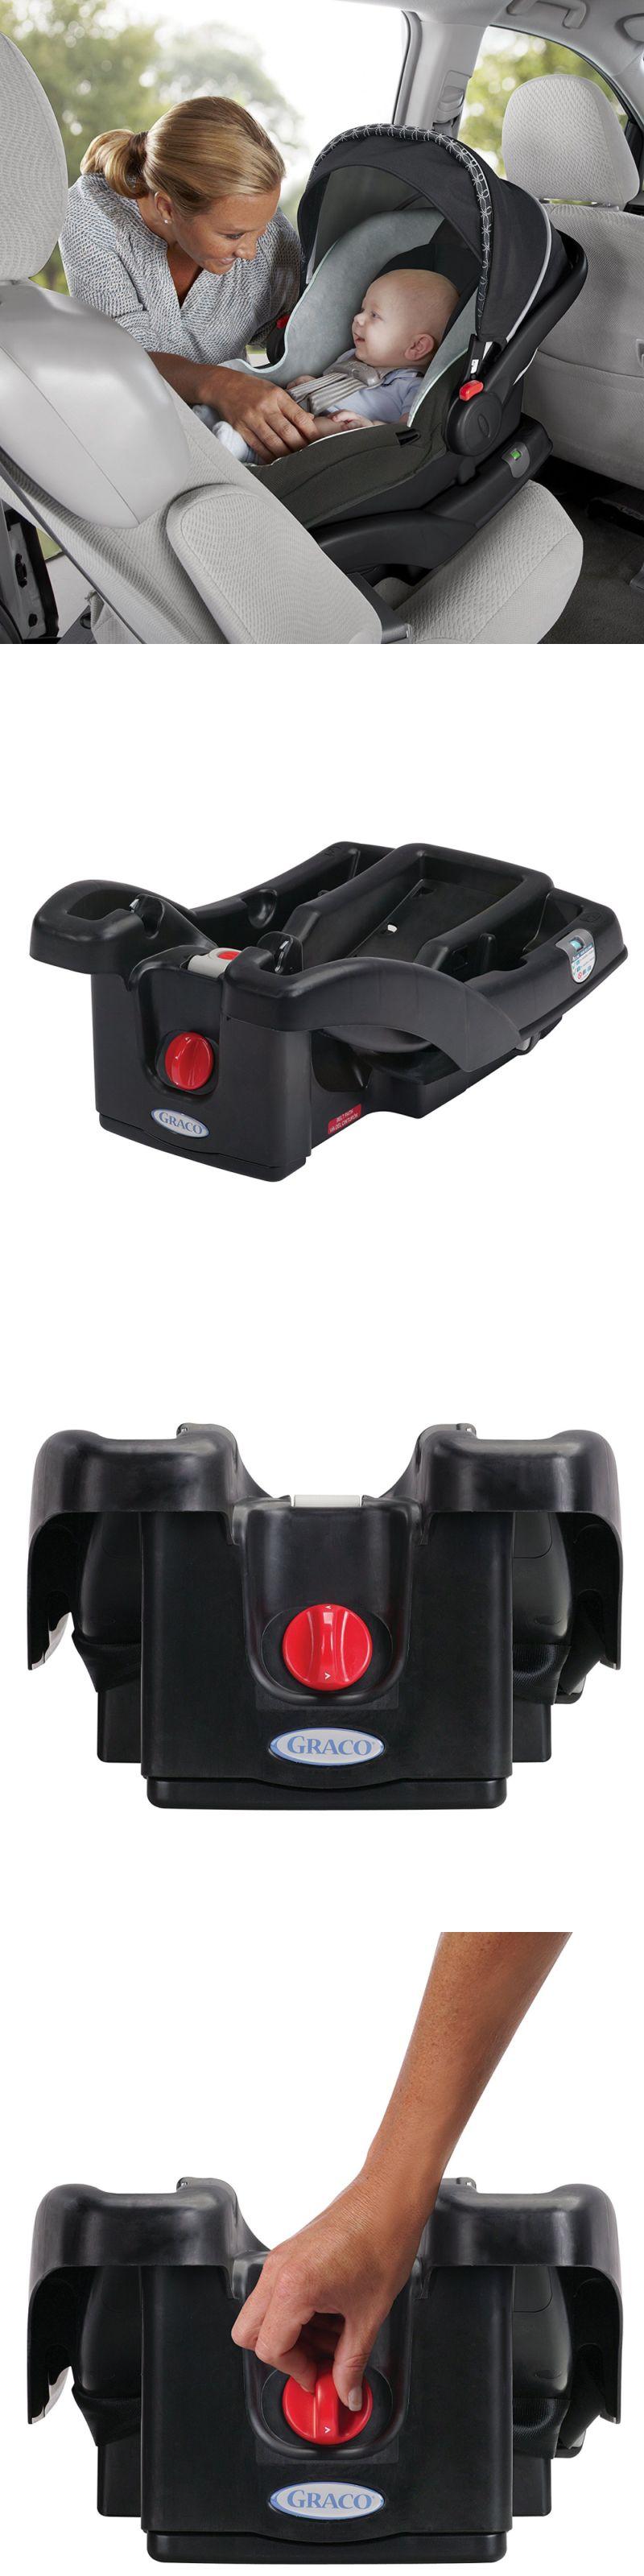 Infant Car Seat 5-20 lbs 66696: Black Graco Snugride Click Connect ...